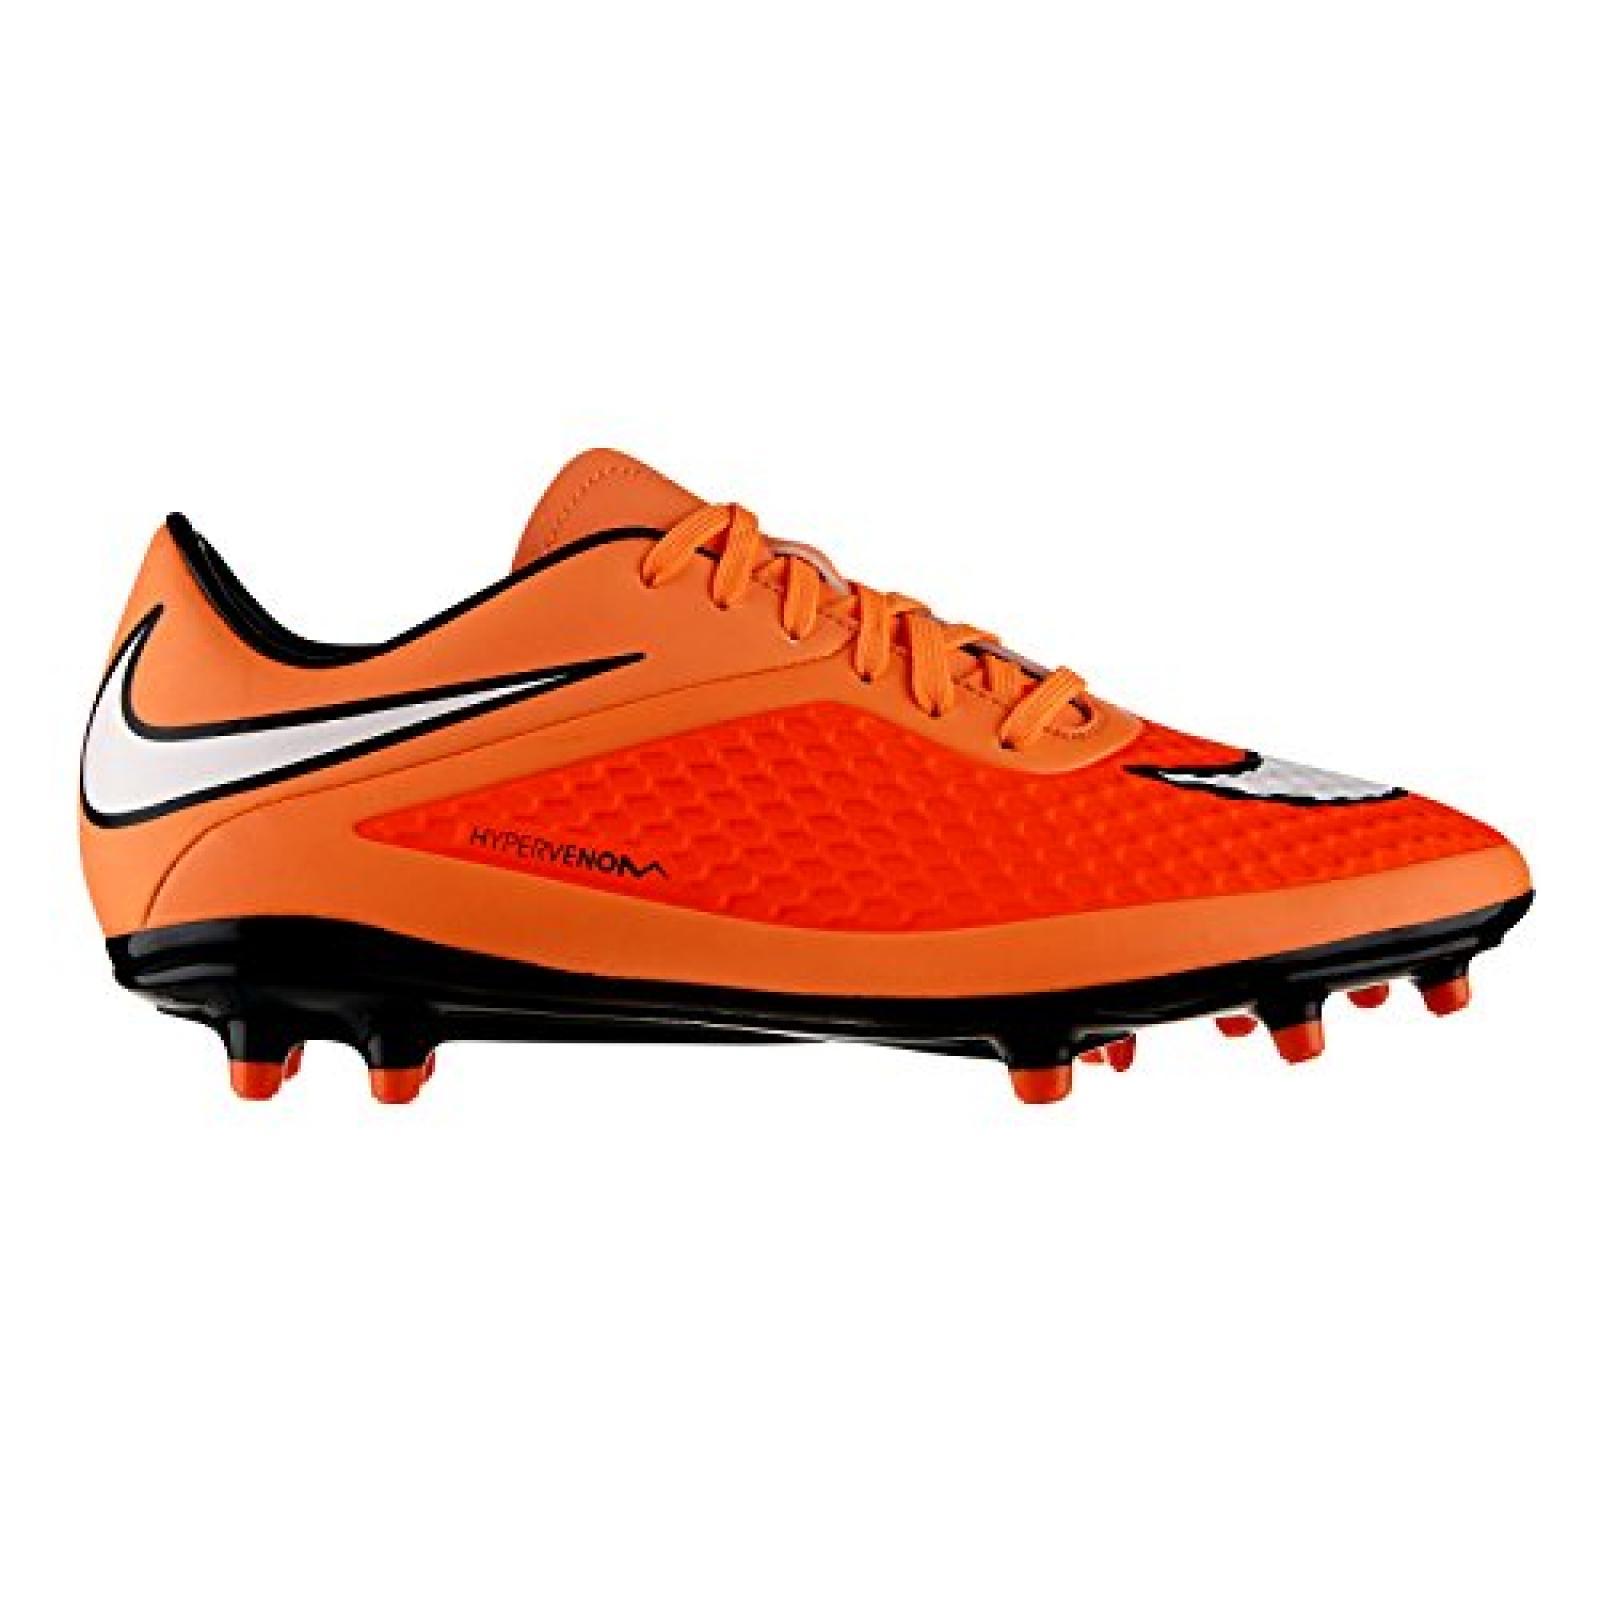 Nike 599730 690 Hypervenom Phelon Fg Herren Sportschuhe - Fußball